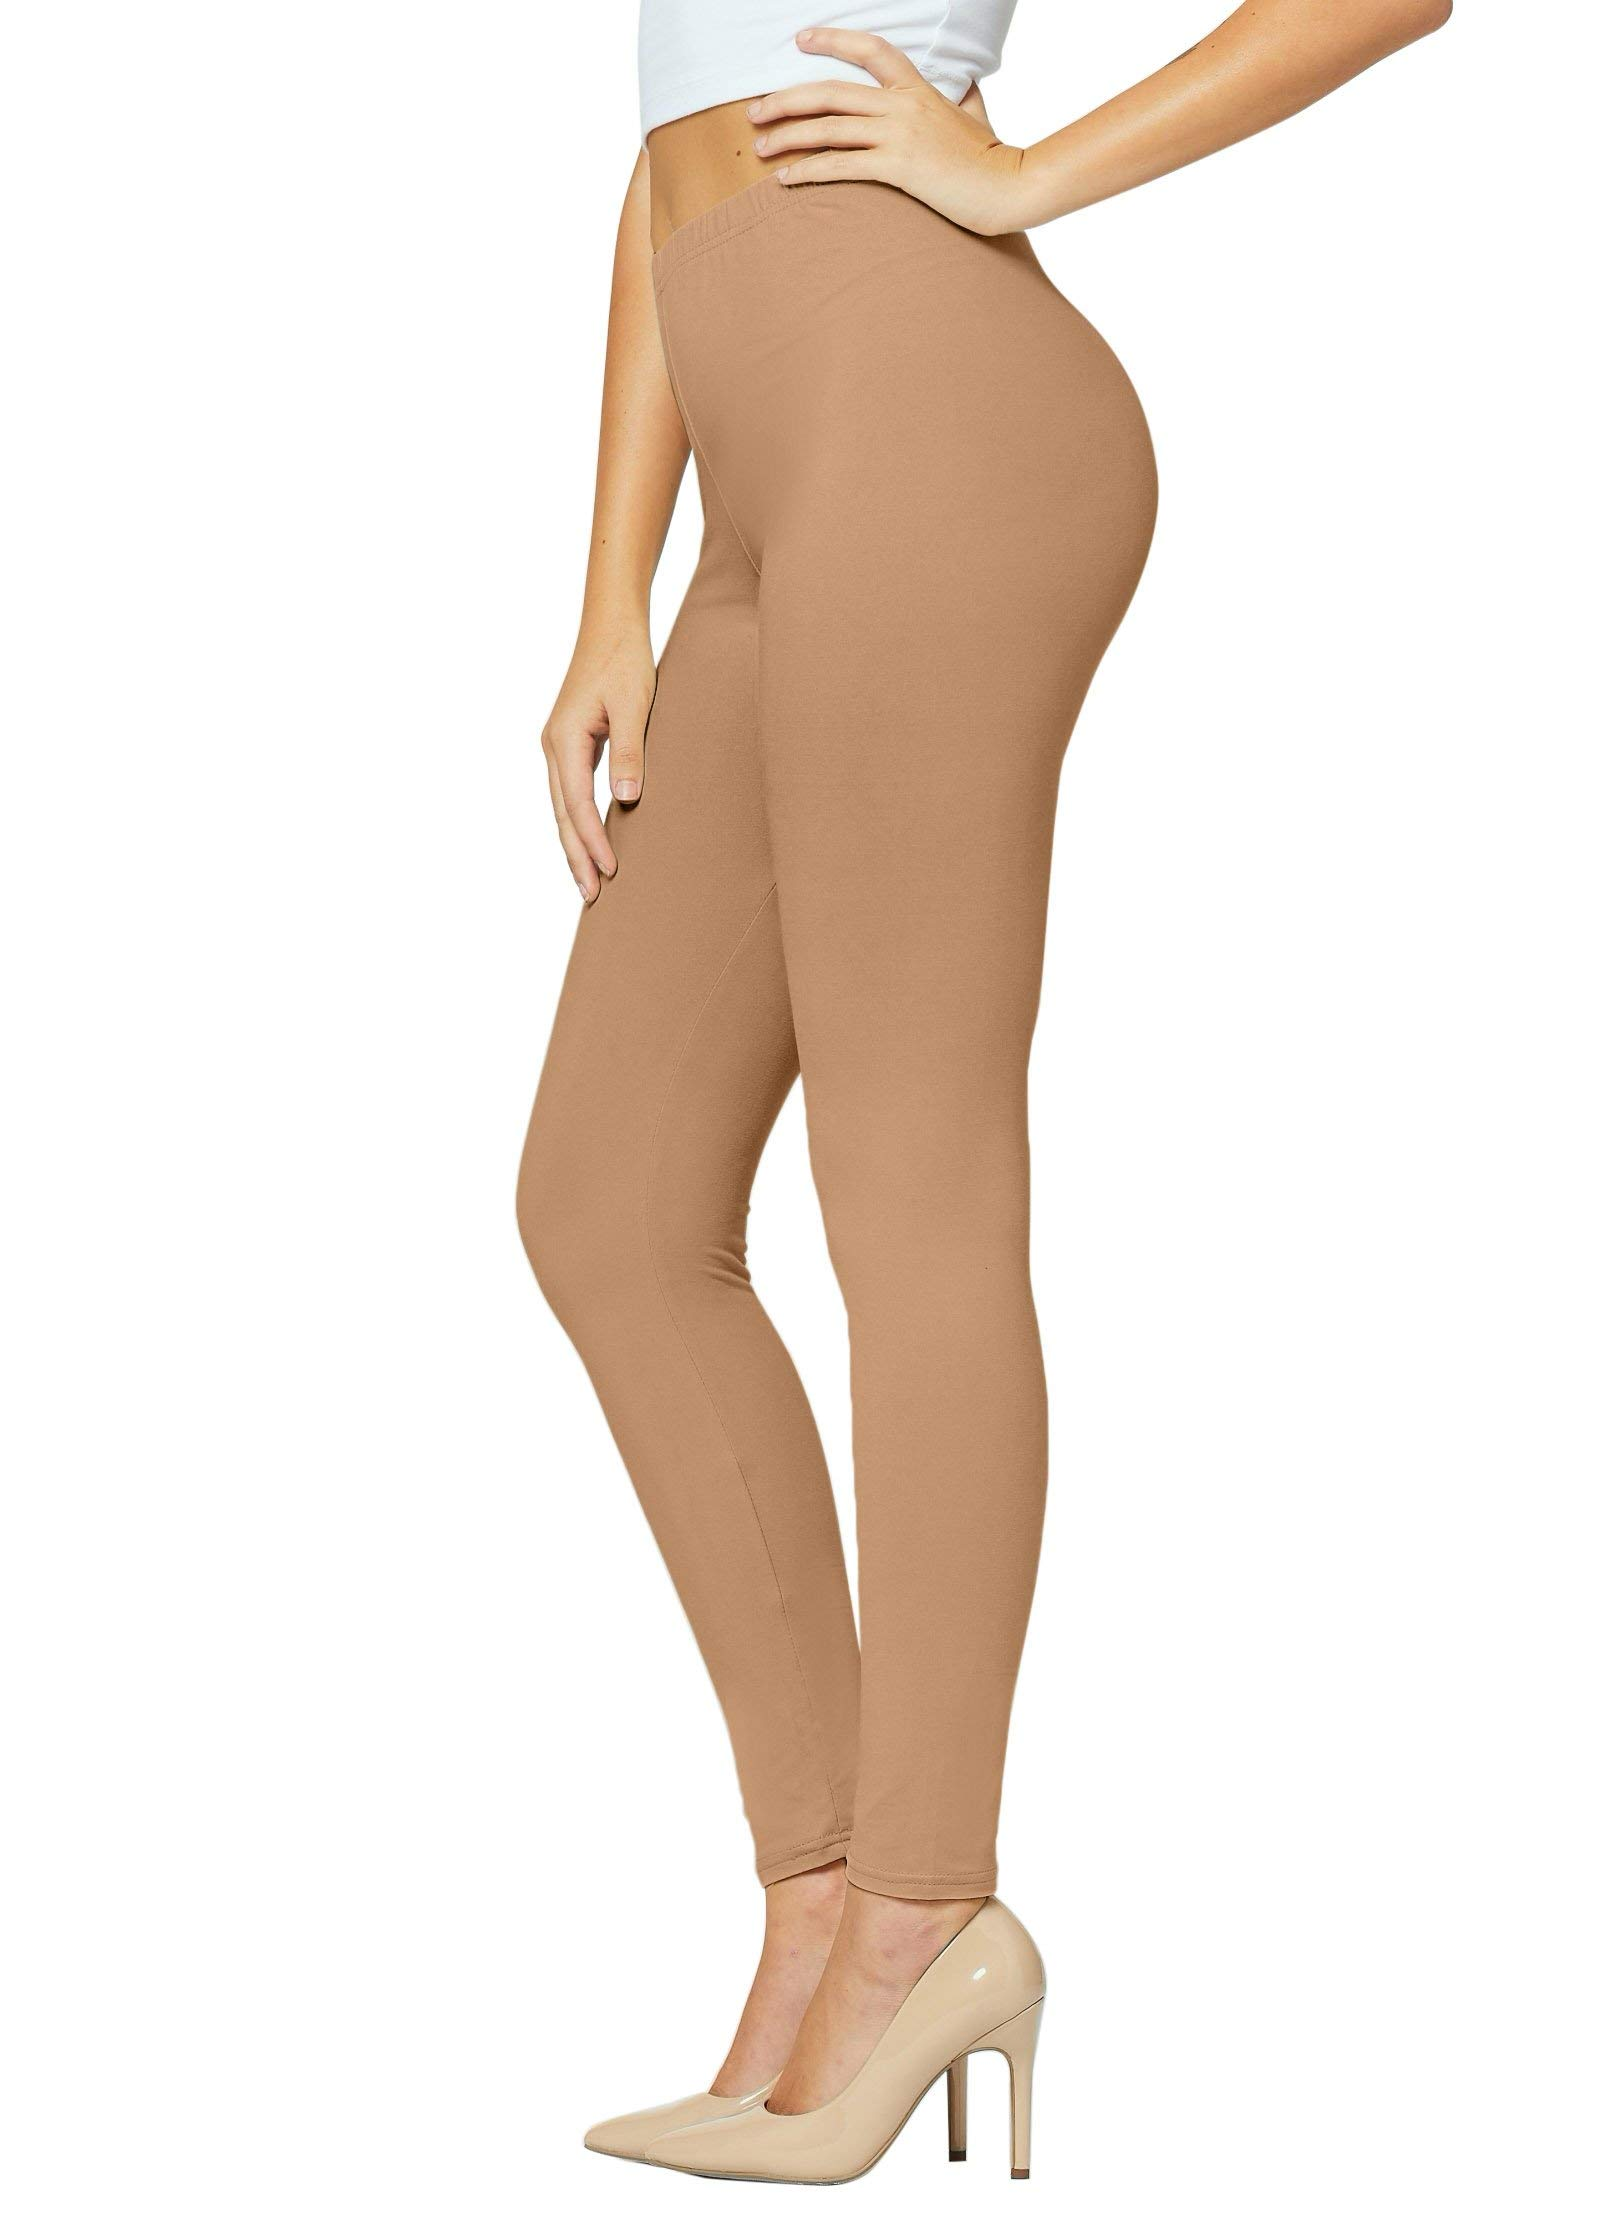 Premium Ultra Soft Leggings for Women in 25 Colors - Full & Capri Length - Reg and Plus Size